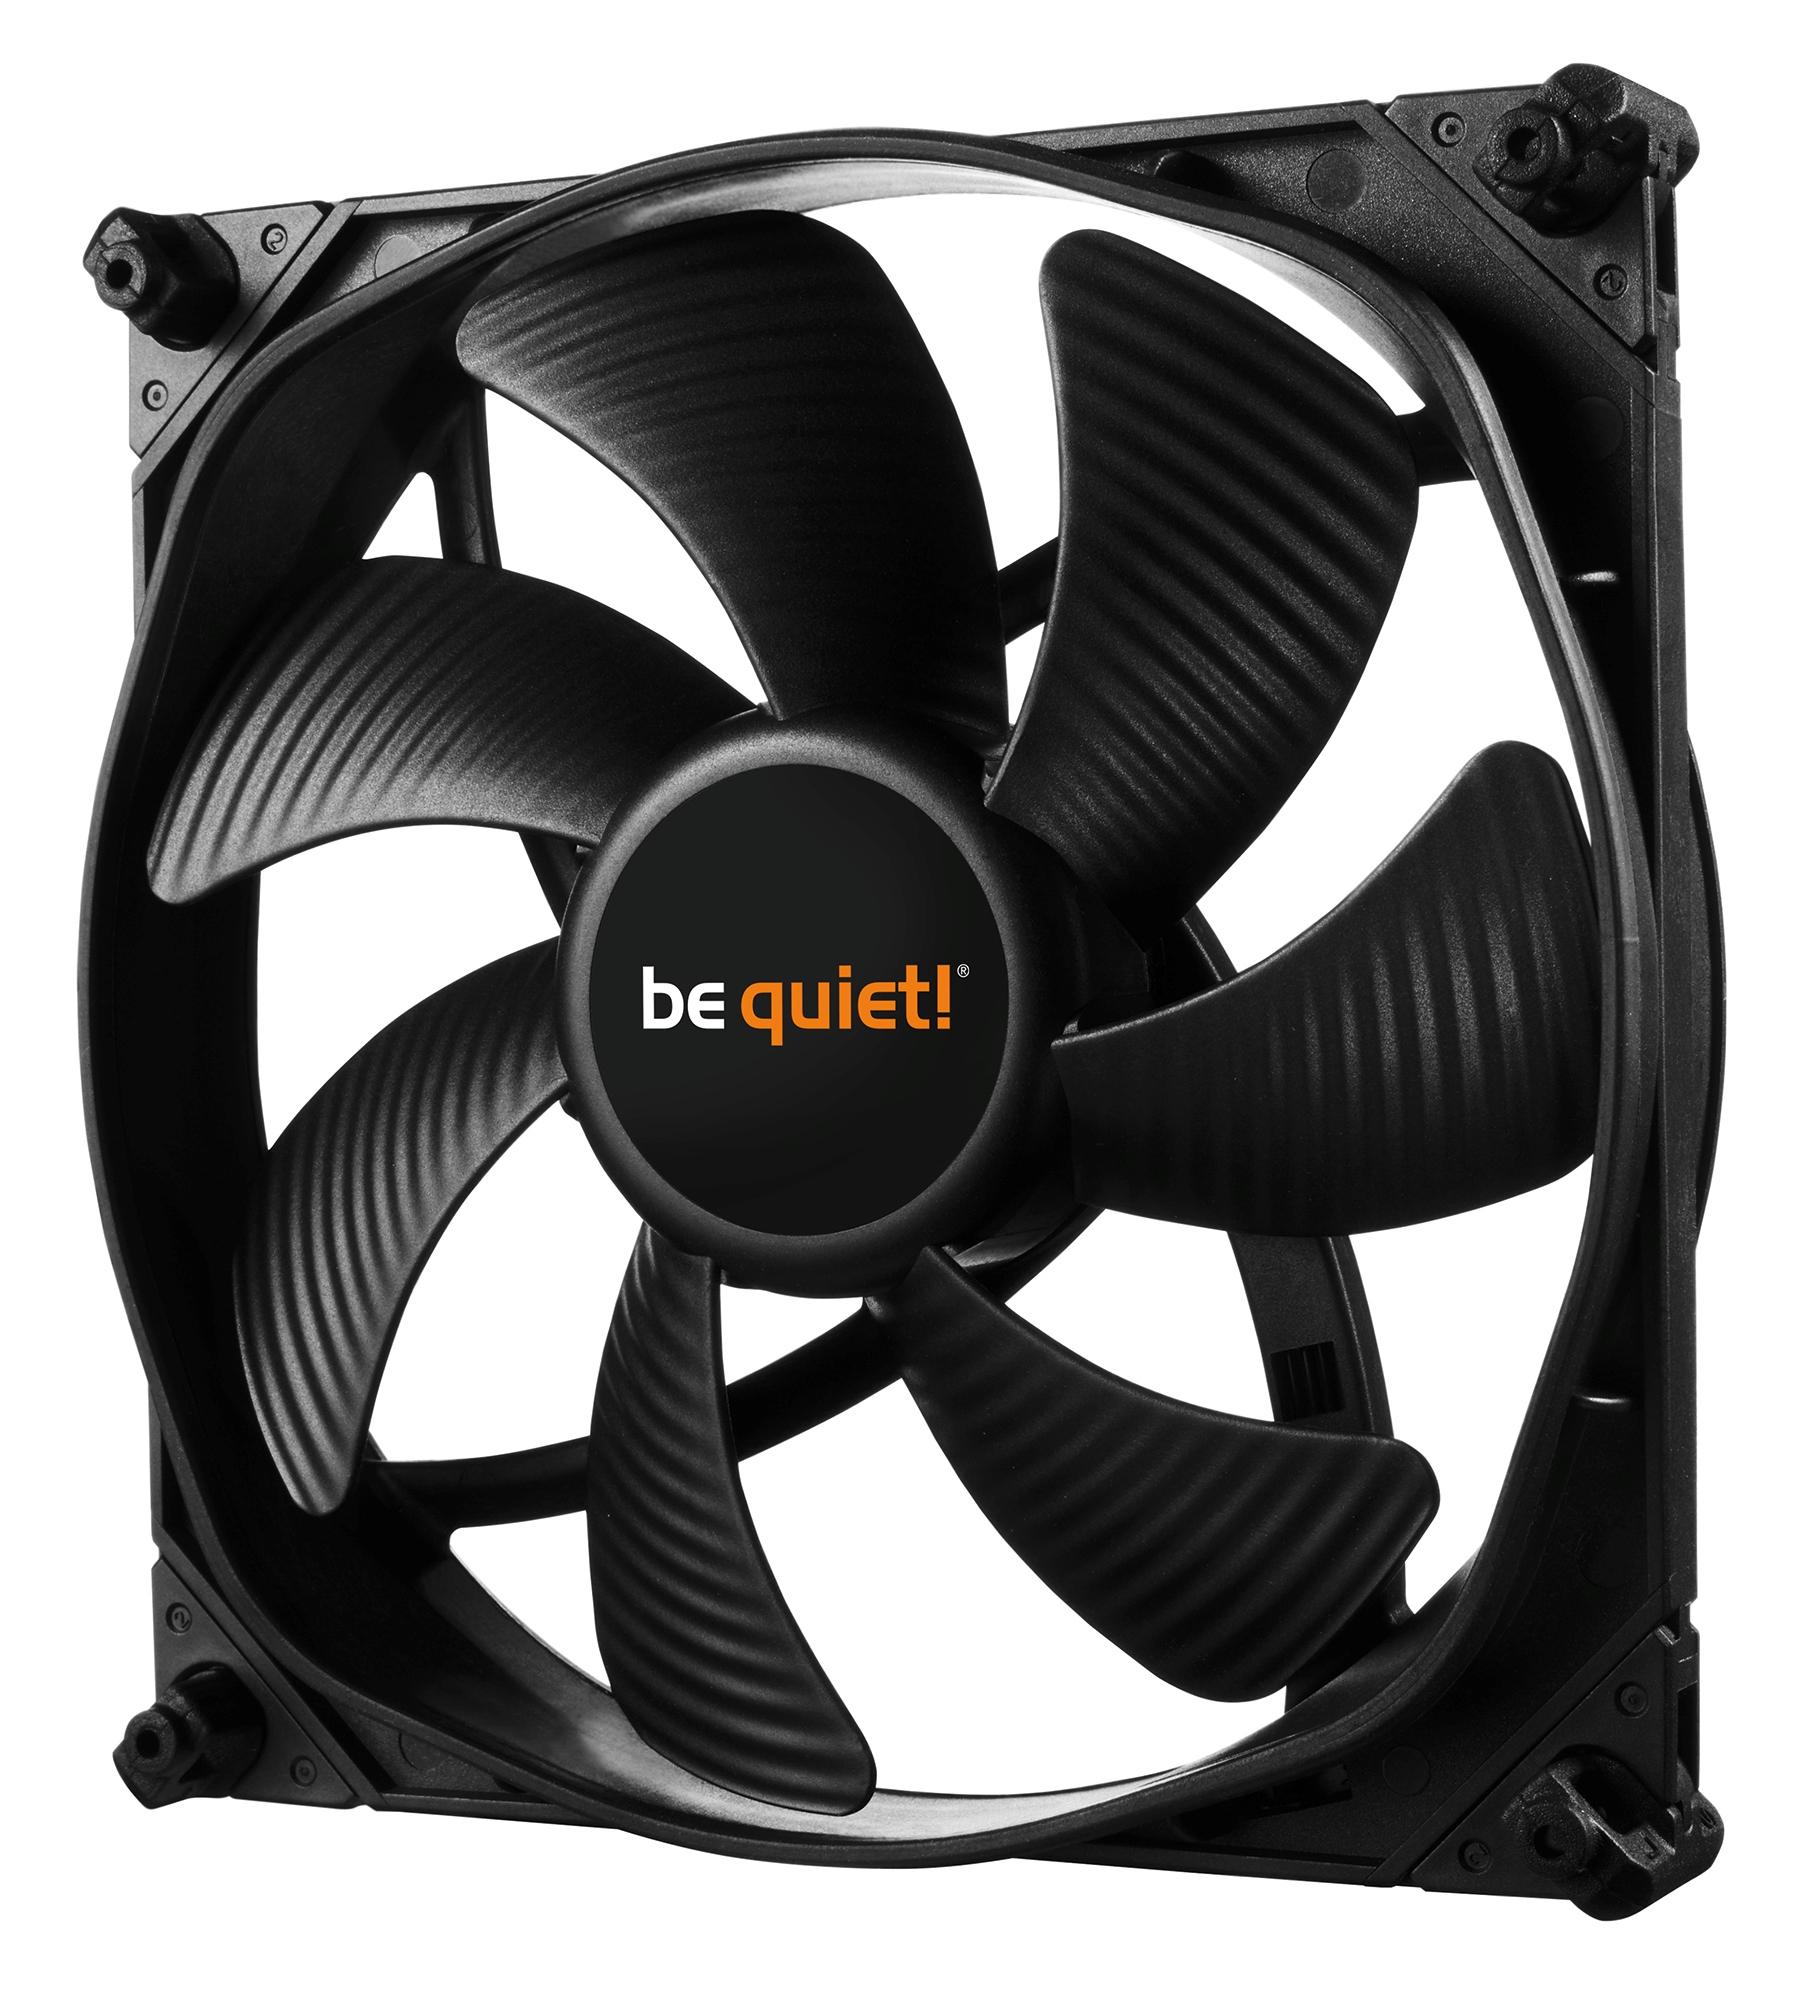 be quiet! SilentWings 3 140mm PWM high-speed, 140x140x25, 1600 rpm, 28,1 dB, 77,57 cfm, 4 pin